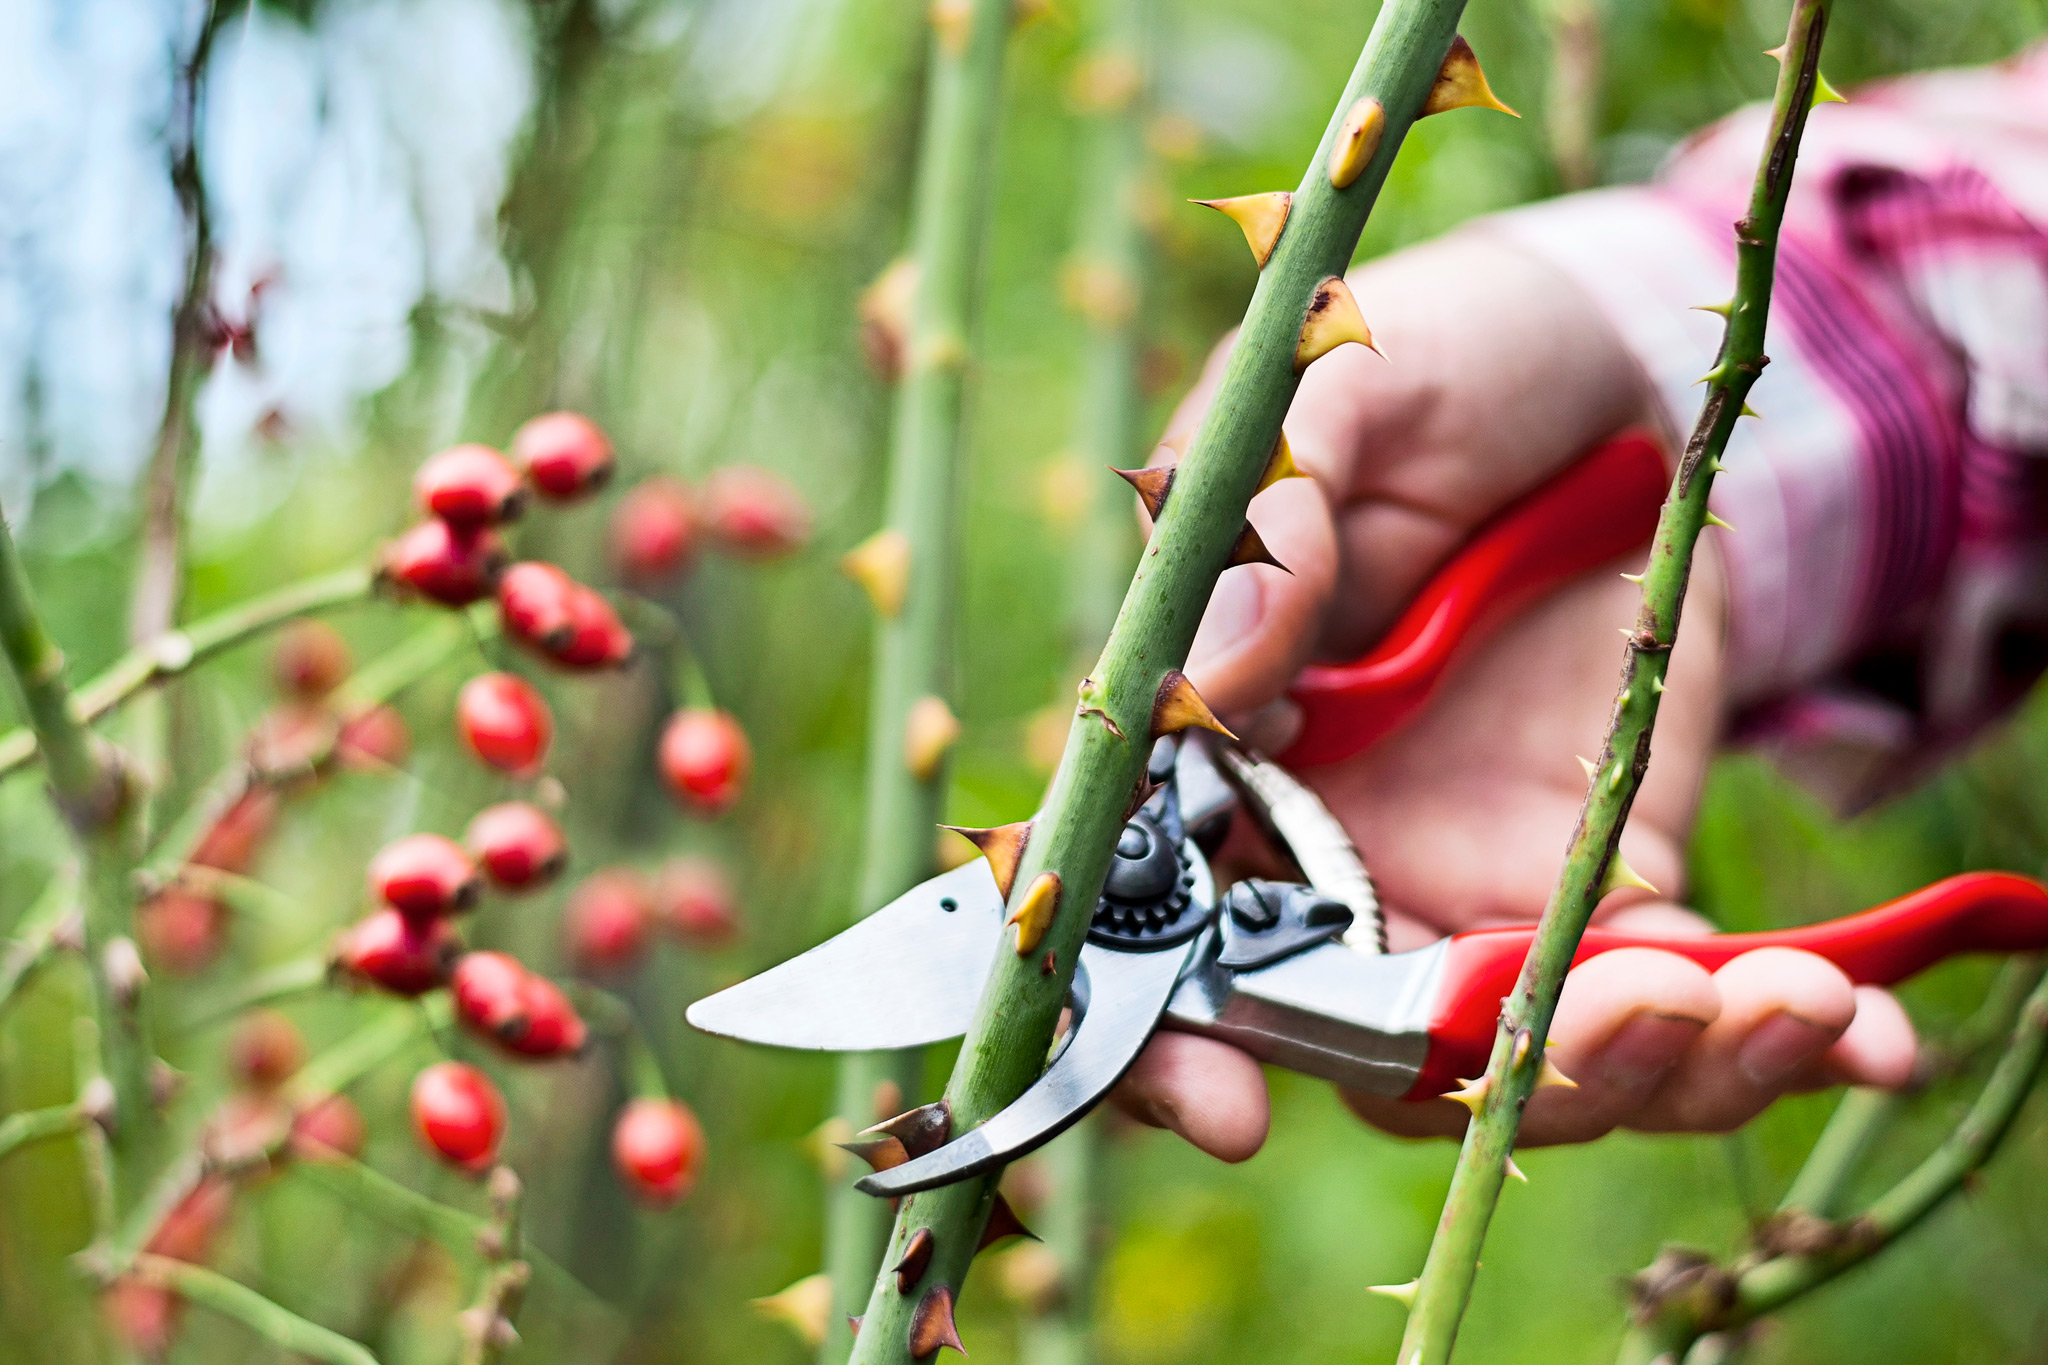 Shortening a long rose stem